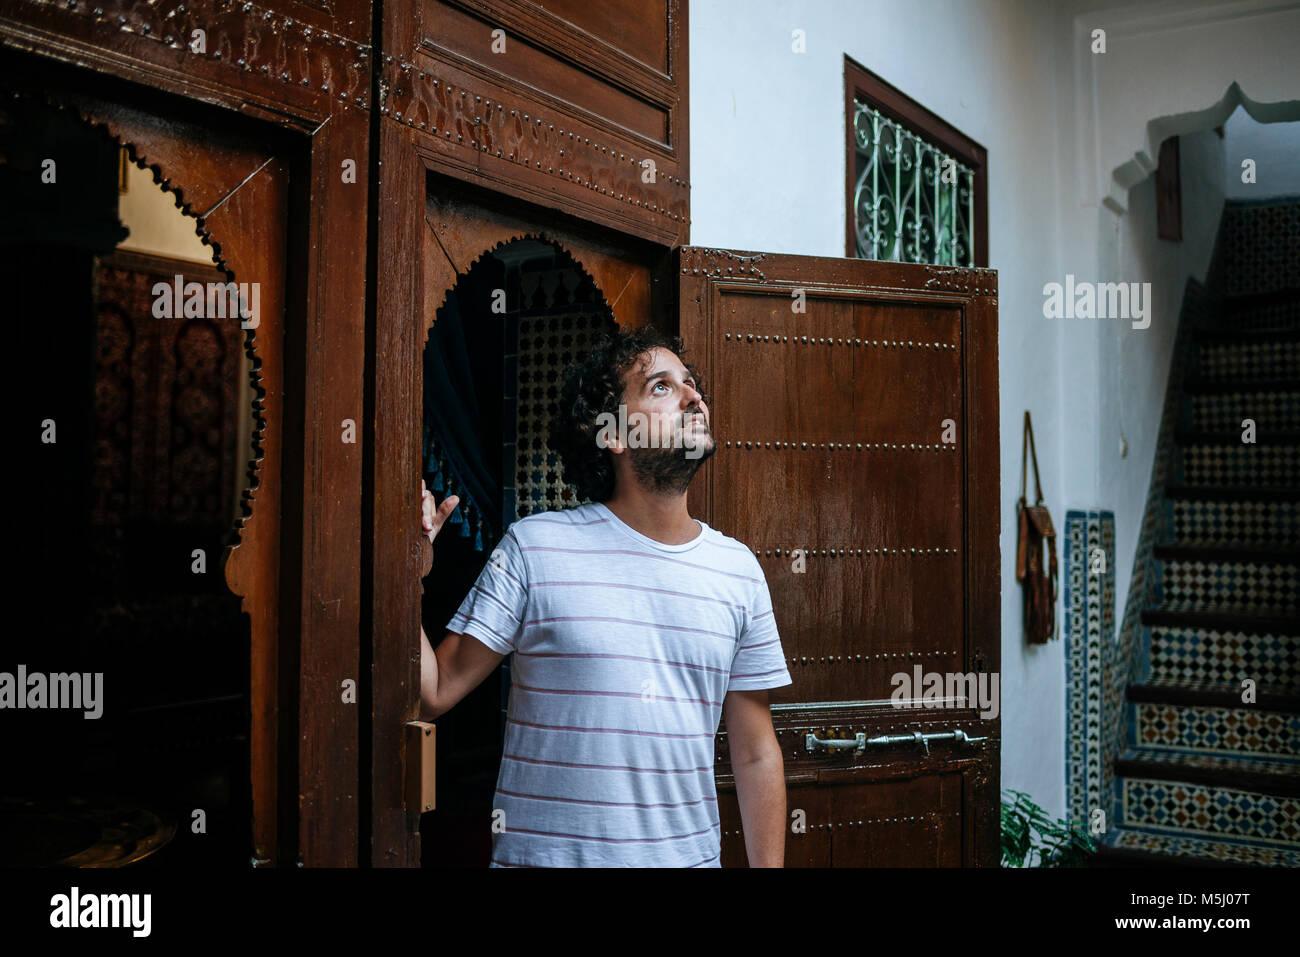 Marokko, Tanger, touristische traditionell marokkanische Architektur bewundern Stockbild